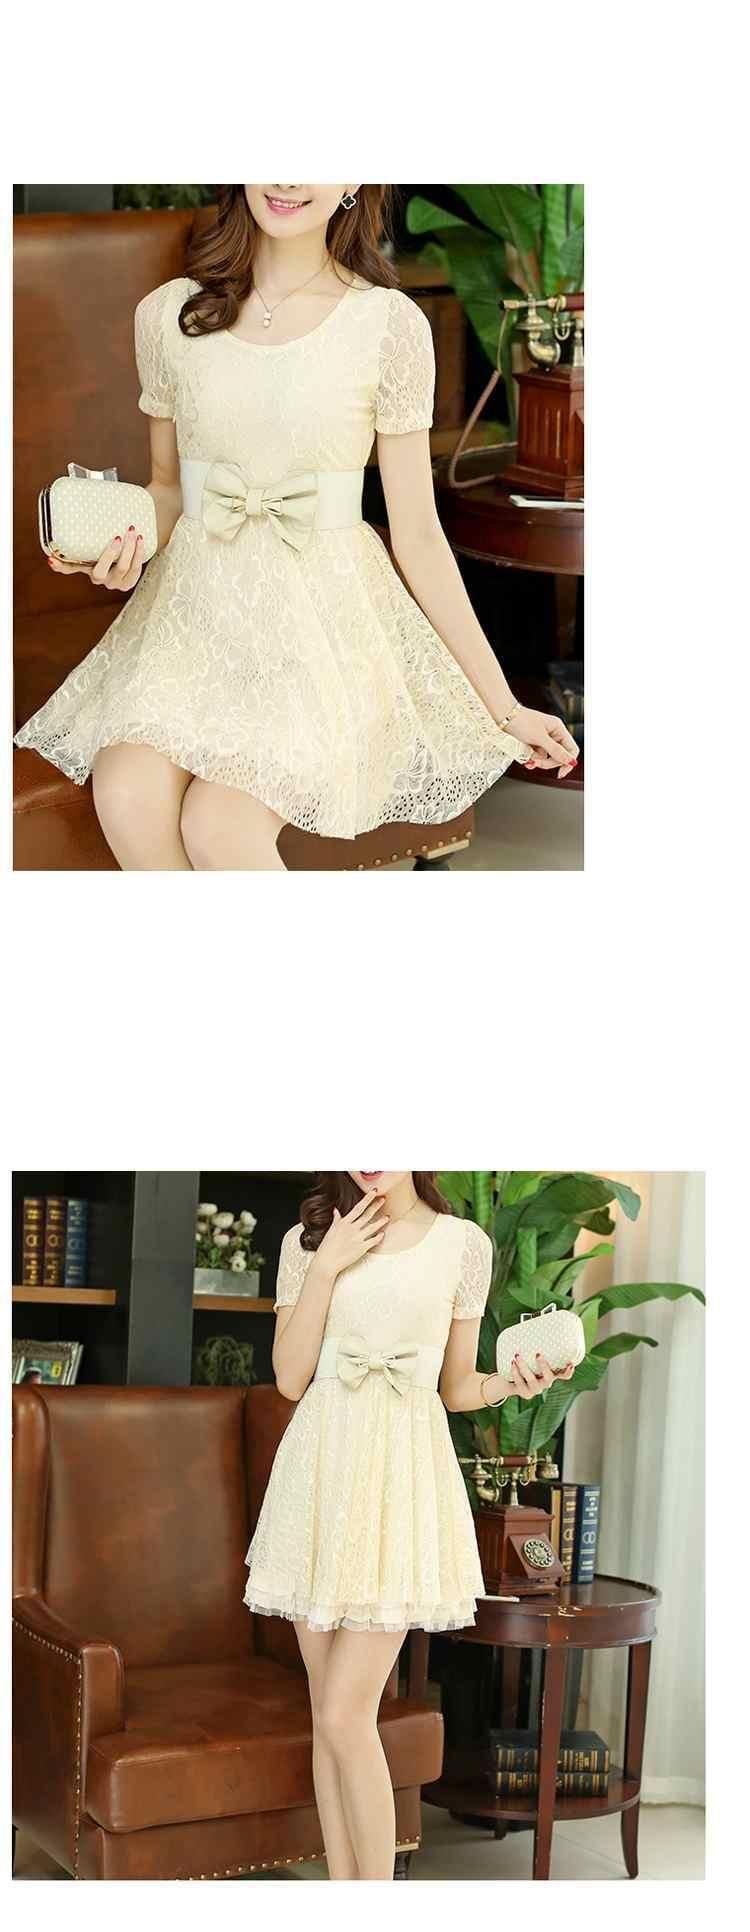 Short-Sleeve Belted Lace Dress - Ringnor | YESSTYLE